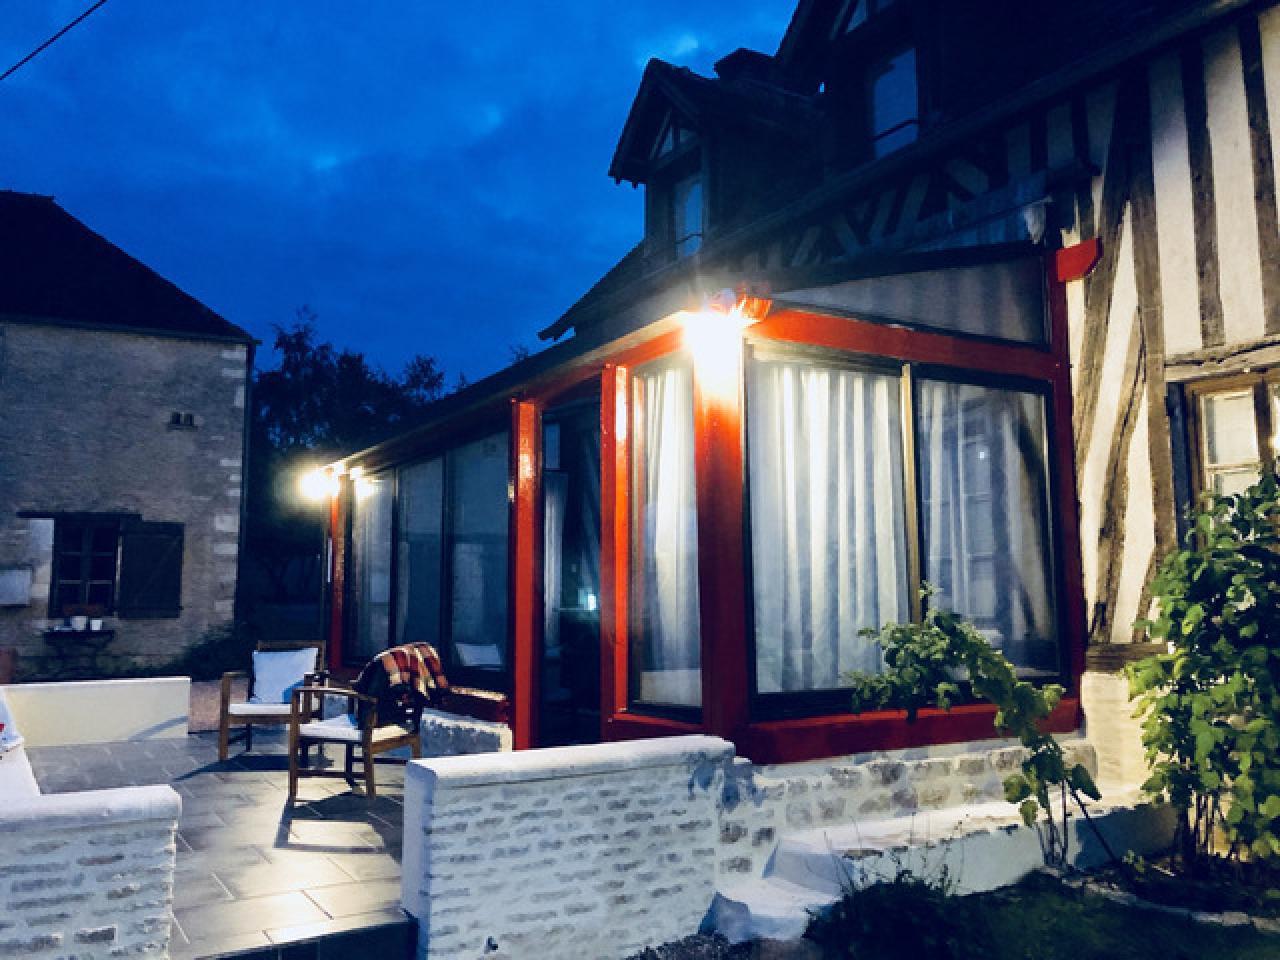 Продаю Дом в Нормандии Франция - 1